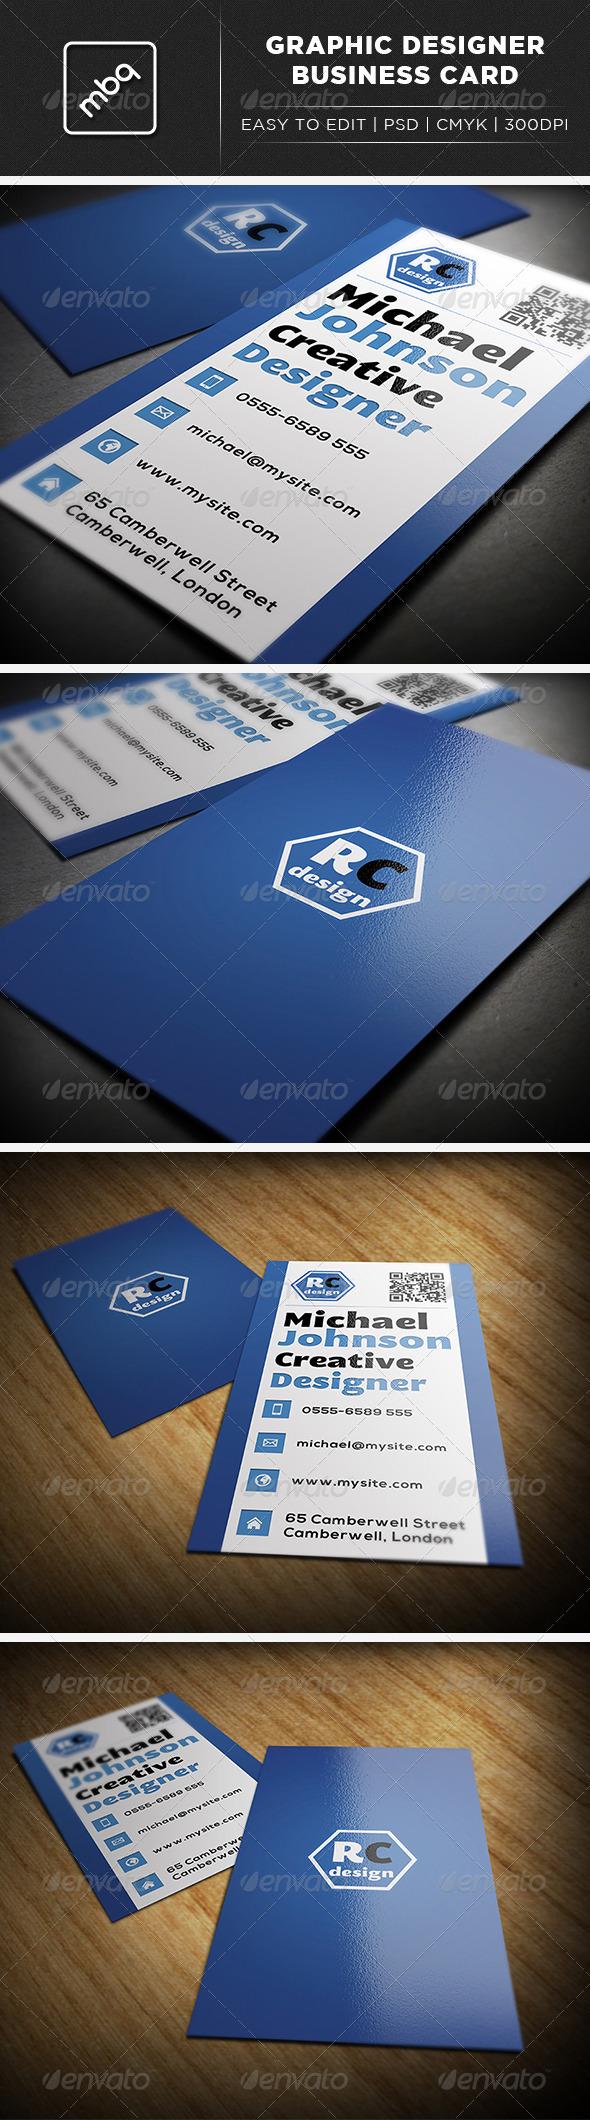 GraphicRiver Graphic Designer Business Card 3052519